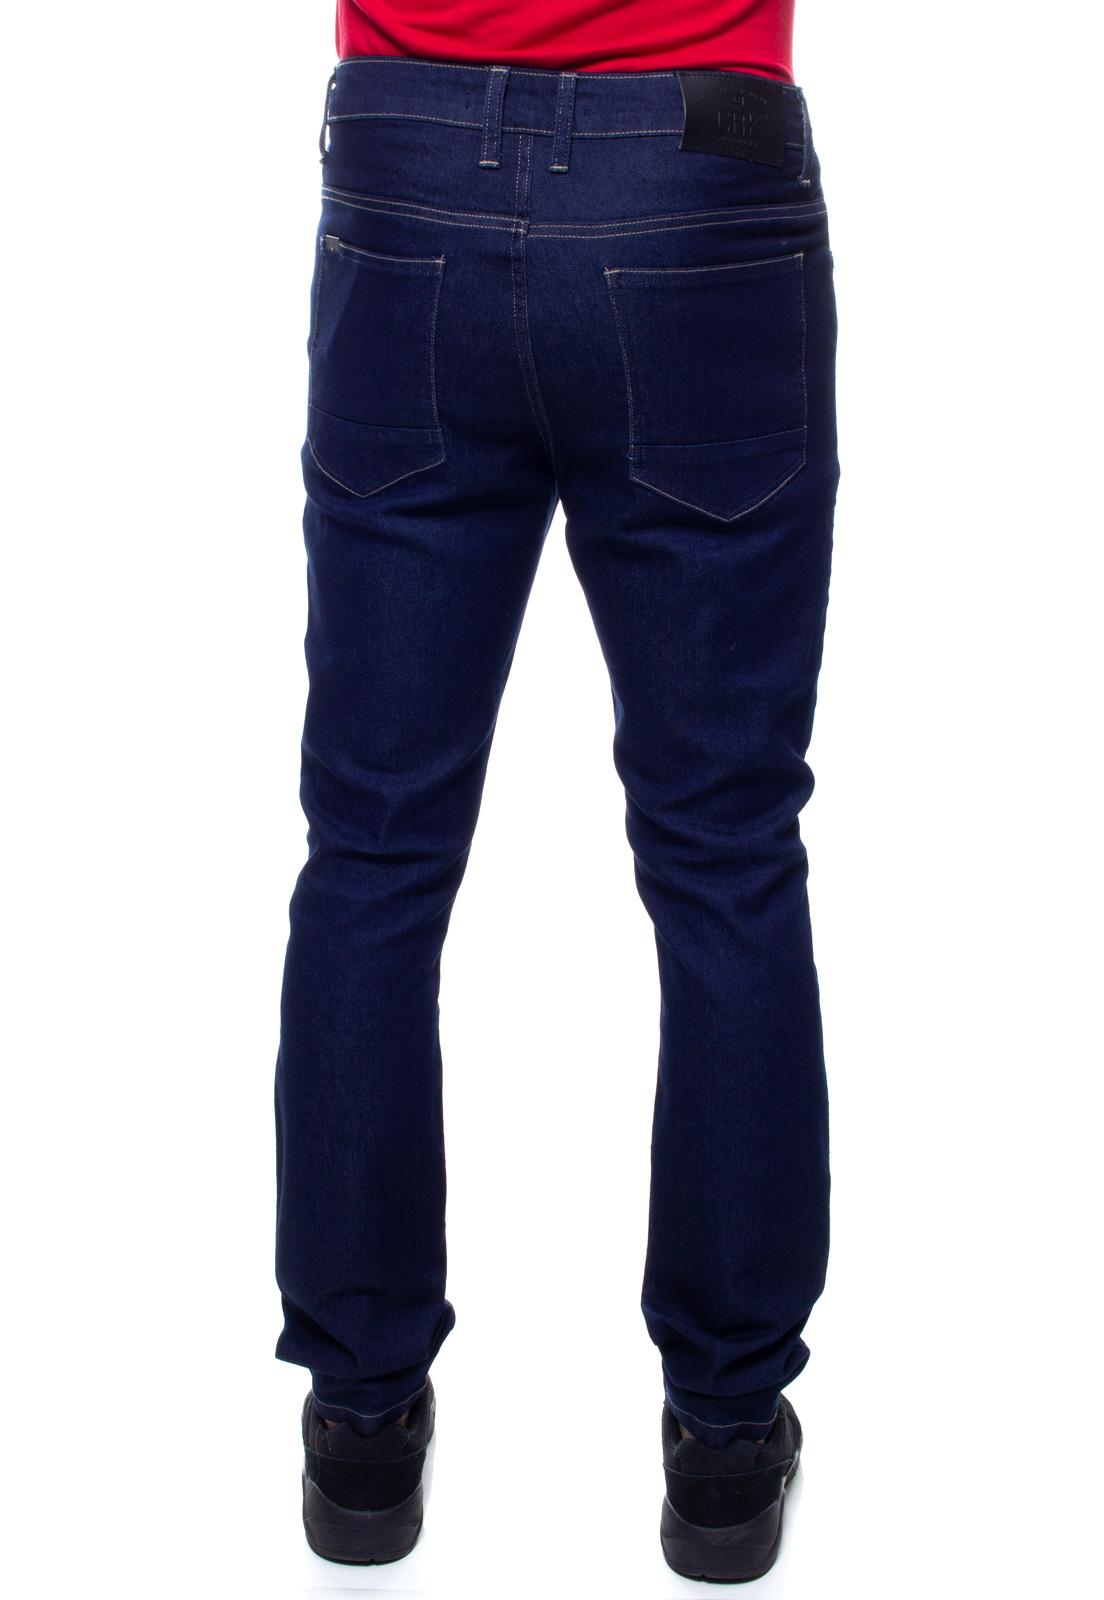 Calça Confort Jeans Masculina Crocker - 48135  - CROCKER JEANS